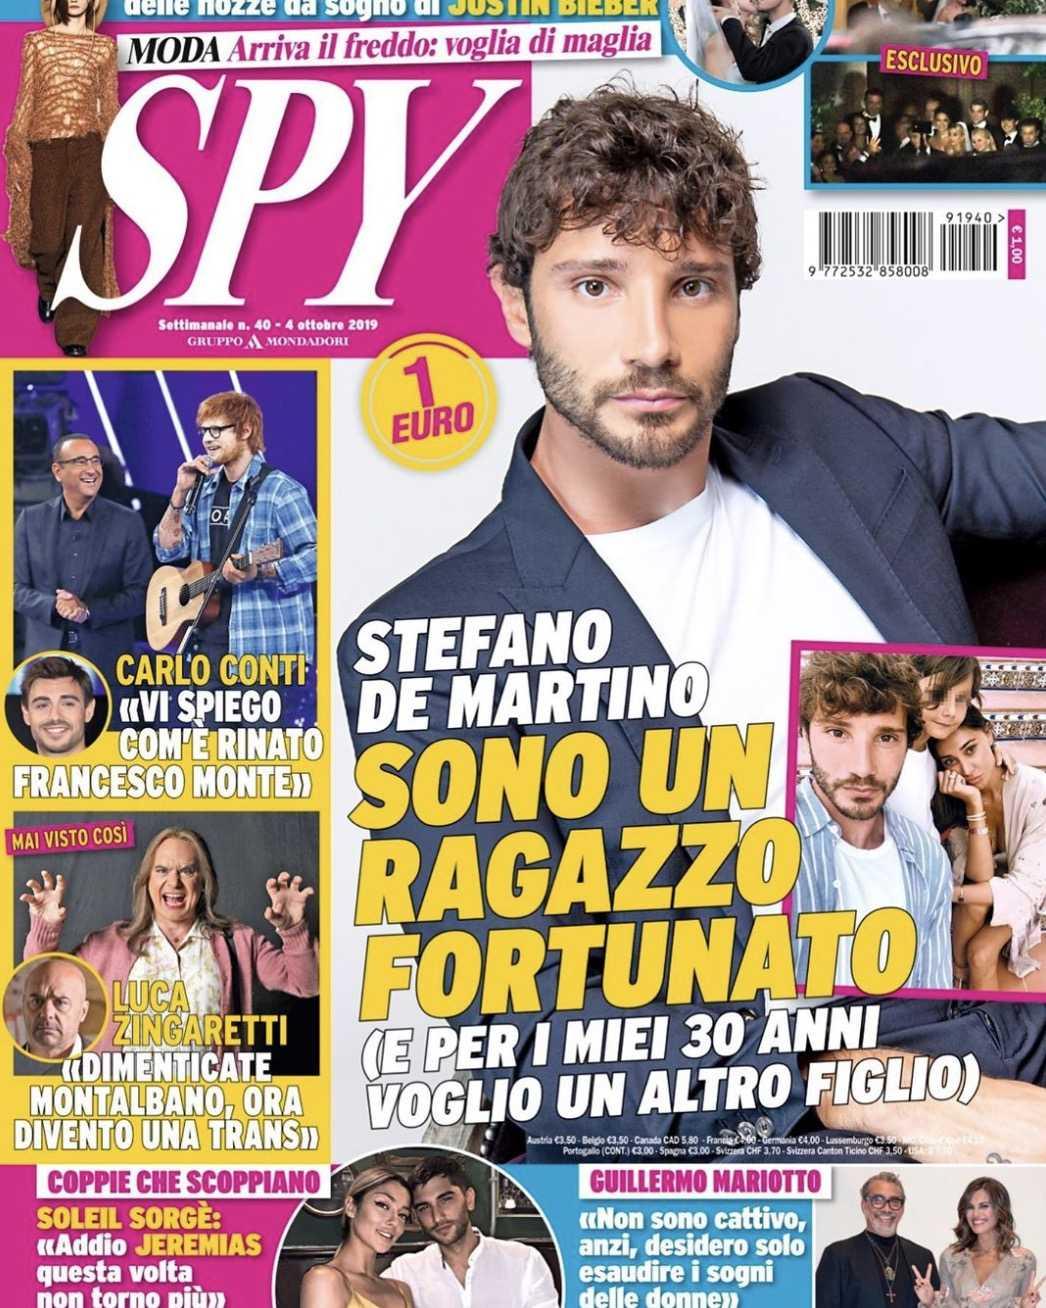 Stefano De Martino padre belen rodriguez incinta santiago